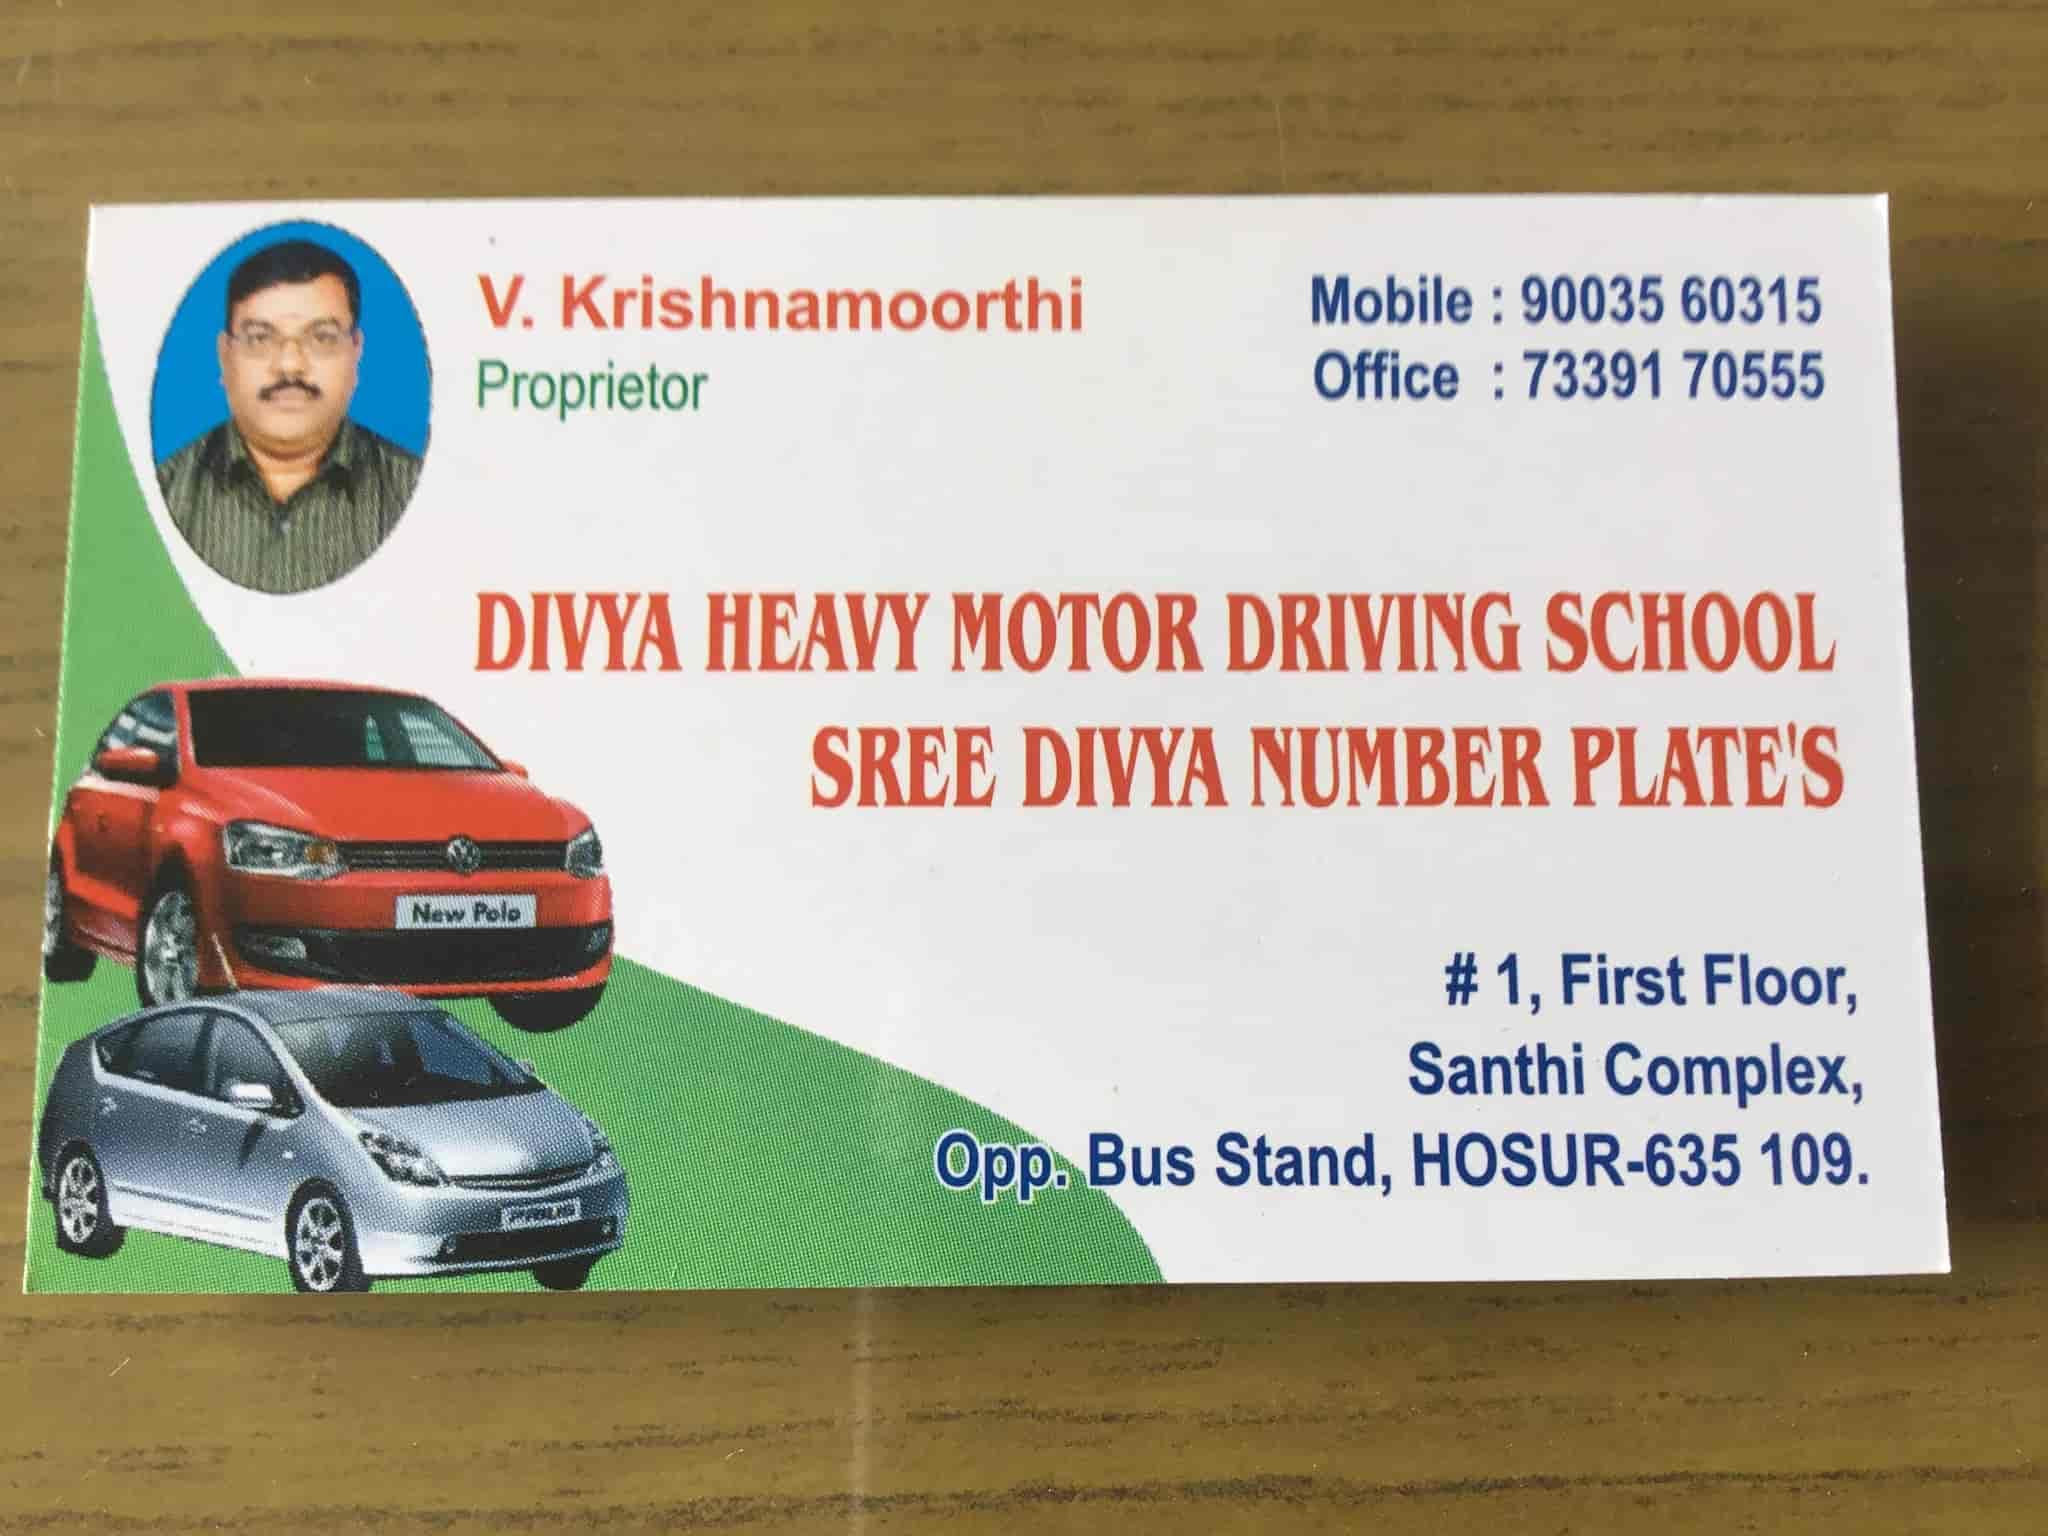 Divya Heavy Motor Driving School, Bagalur Circle - Motor